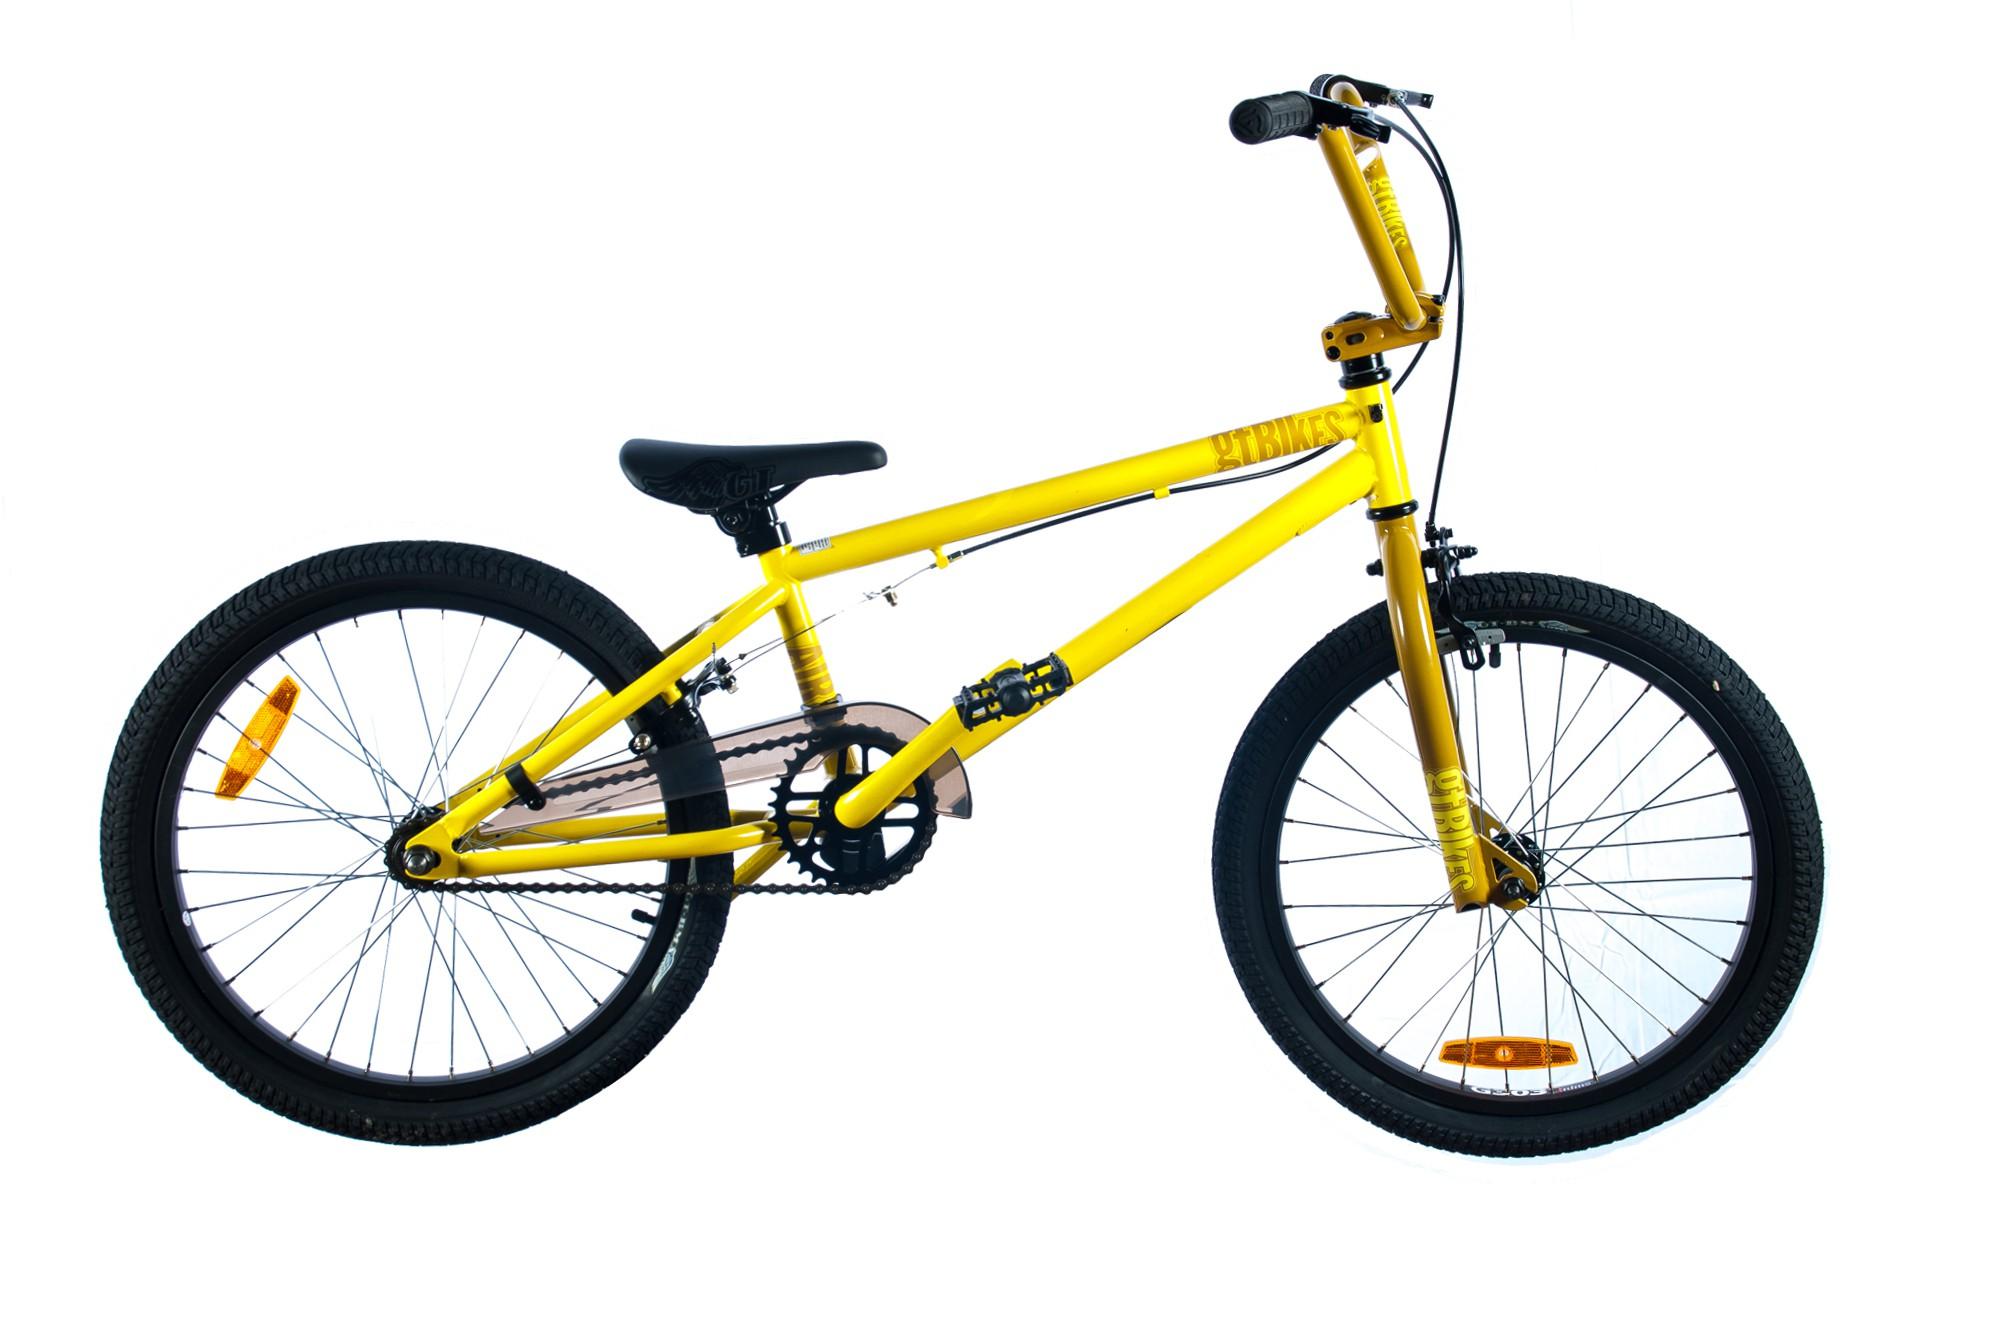 Gt Bmx Bicycles Various Designs Freestyle Bikes New Ebay